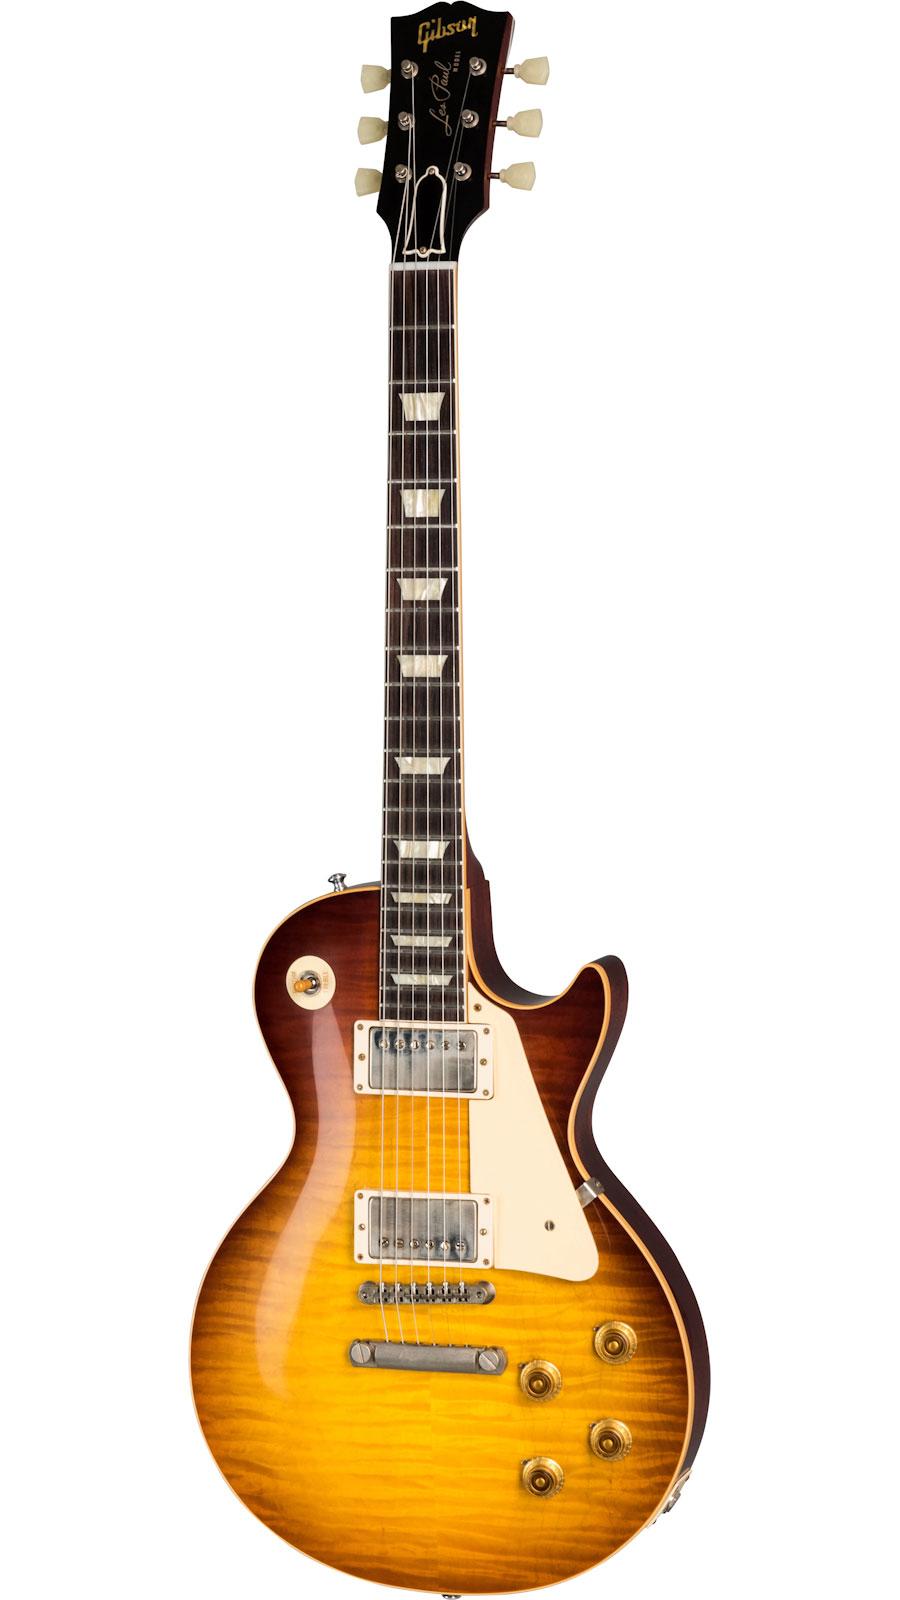 Gibson 60th Anniversary 1959 Les Paul Standard Slow Iced Tea Fade